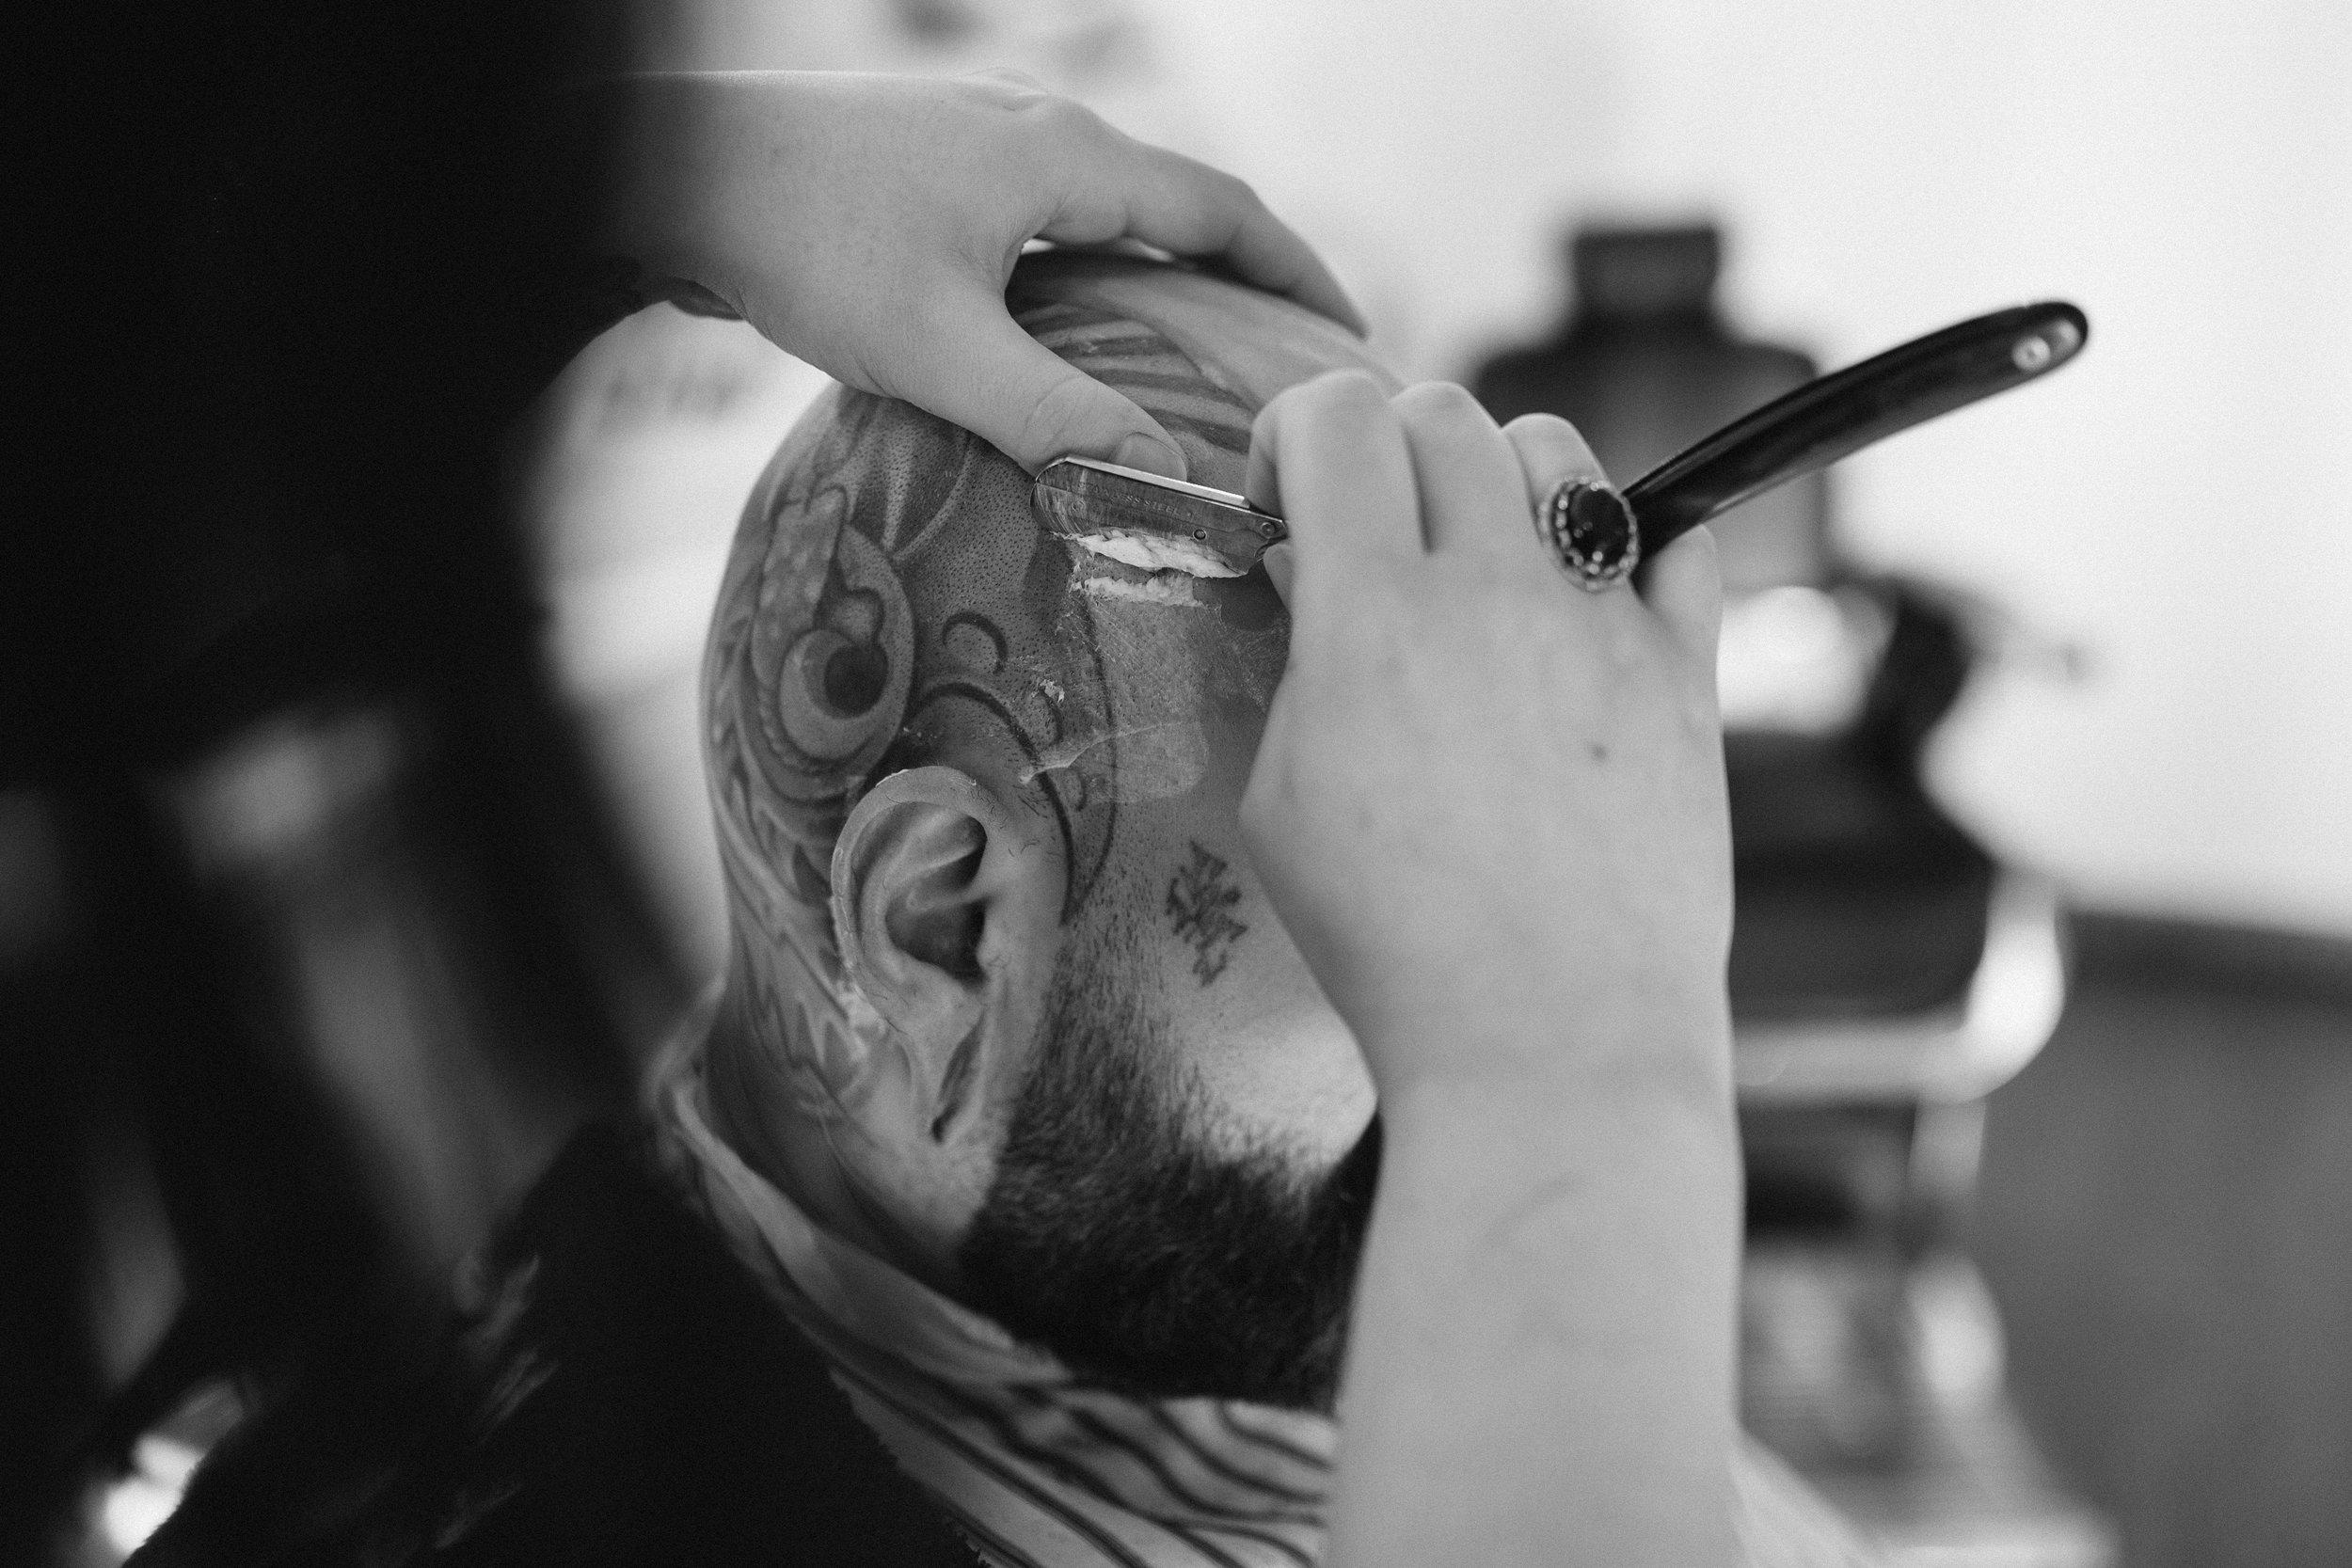 021018 - union barber 5 bw.jpg